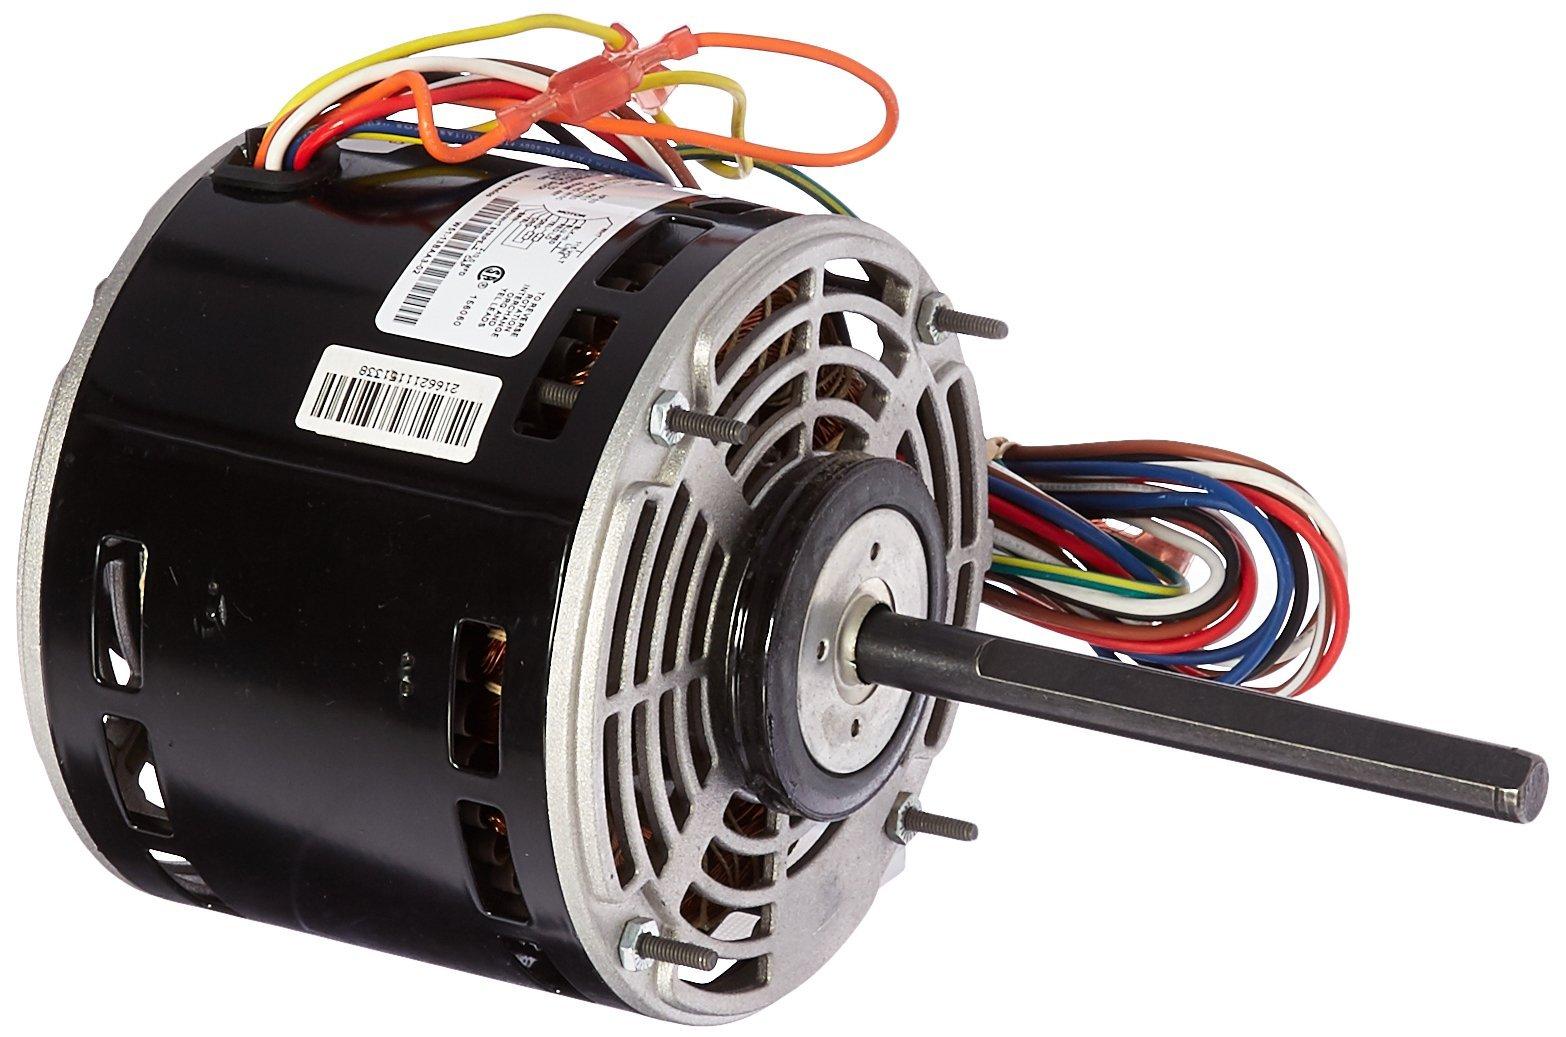 Protech W51-13BAA3-01 Universal Blower Motor